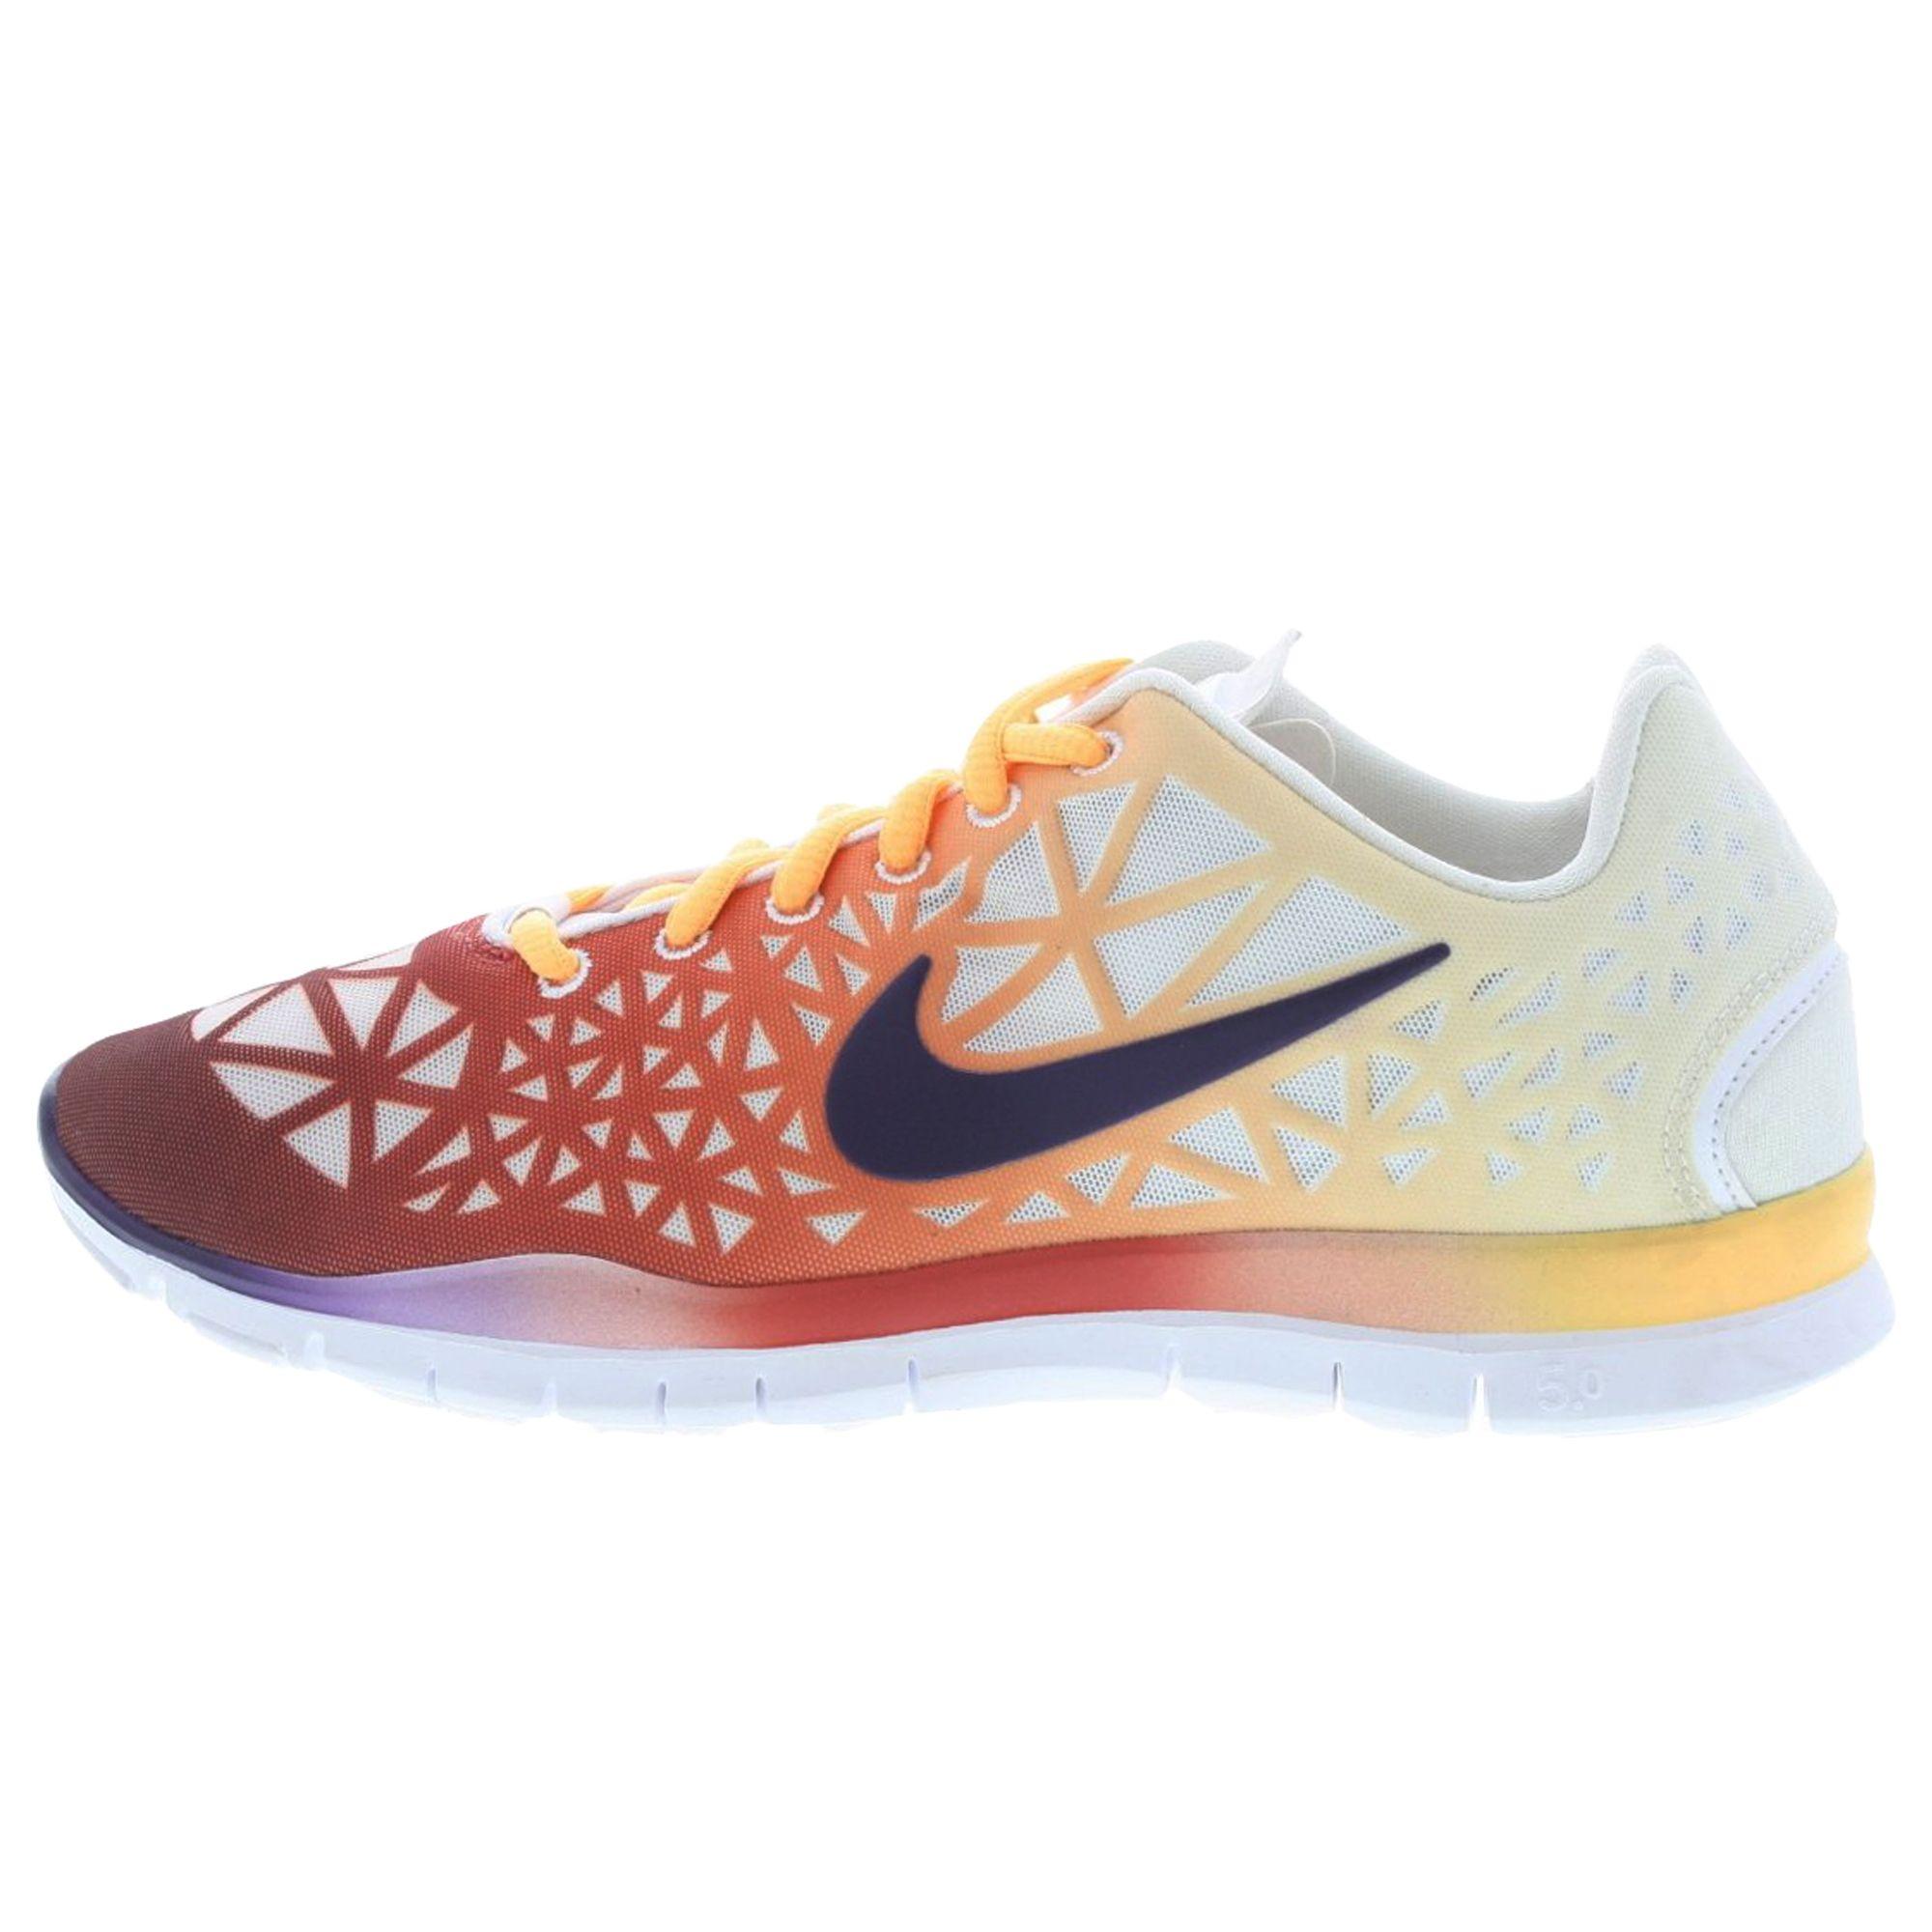 Nike Free Run 5.0 Chaussures De Sport Pour Dames